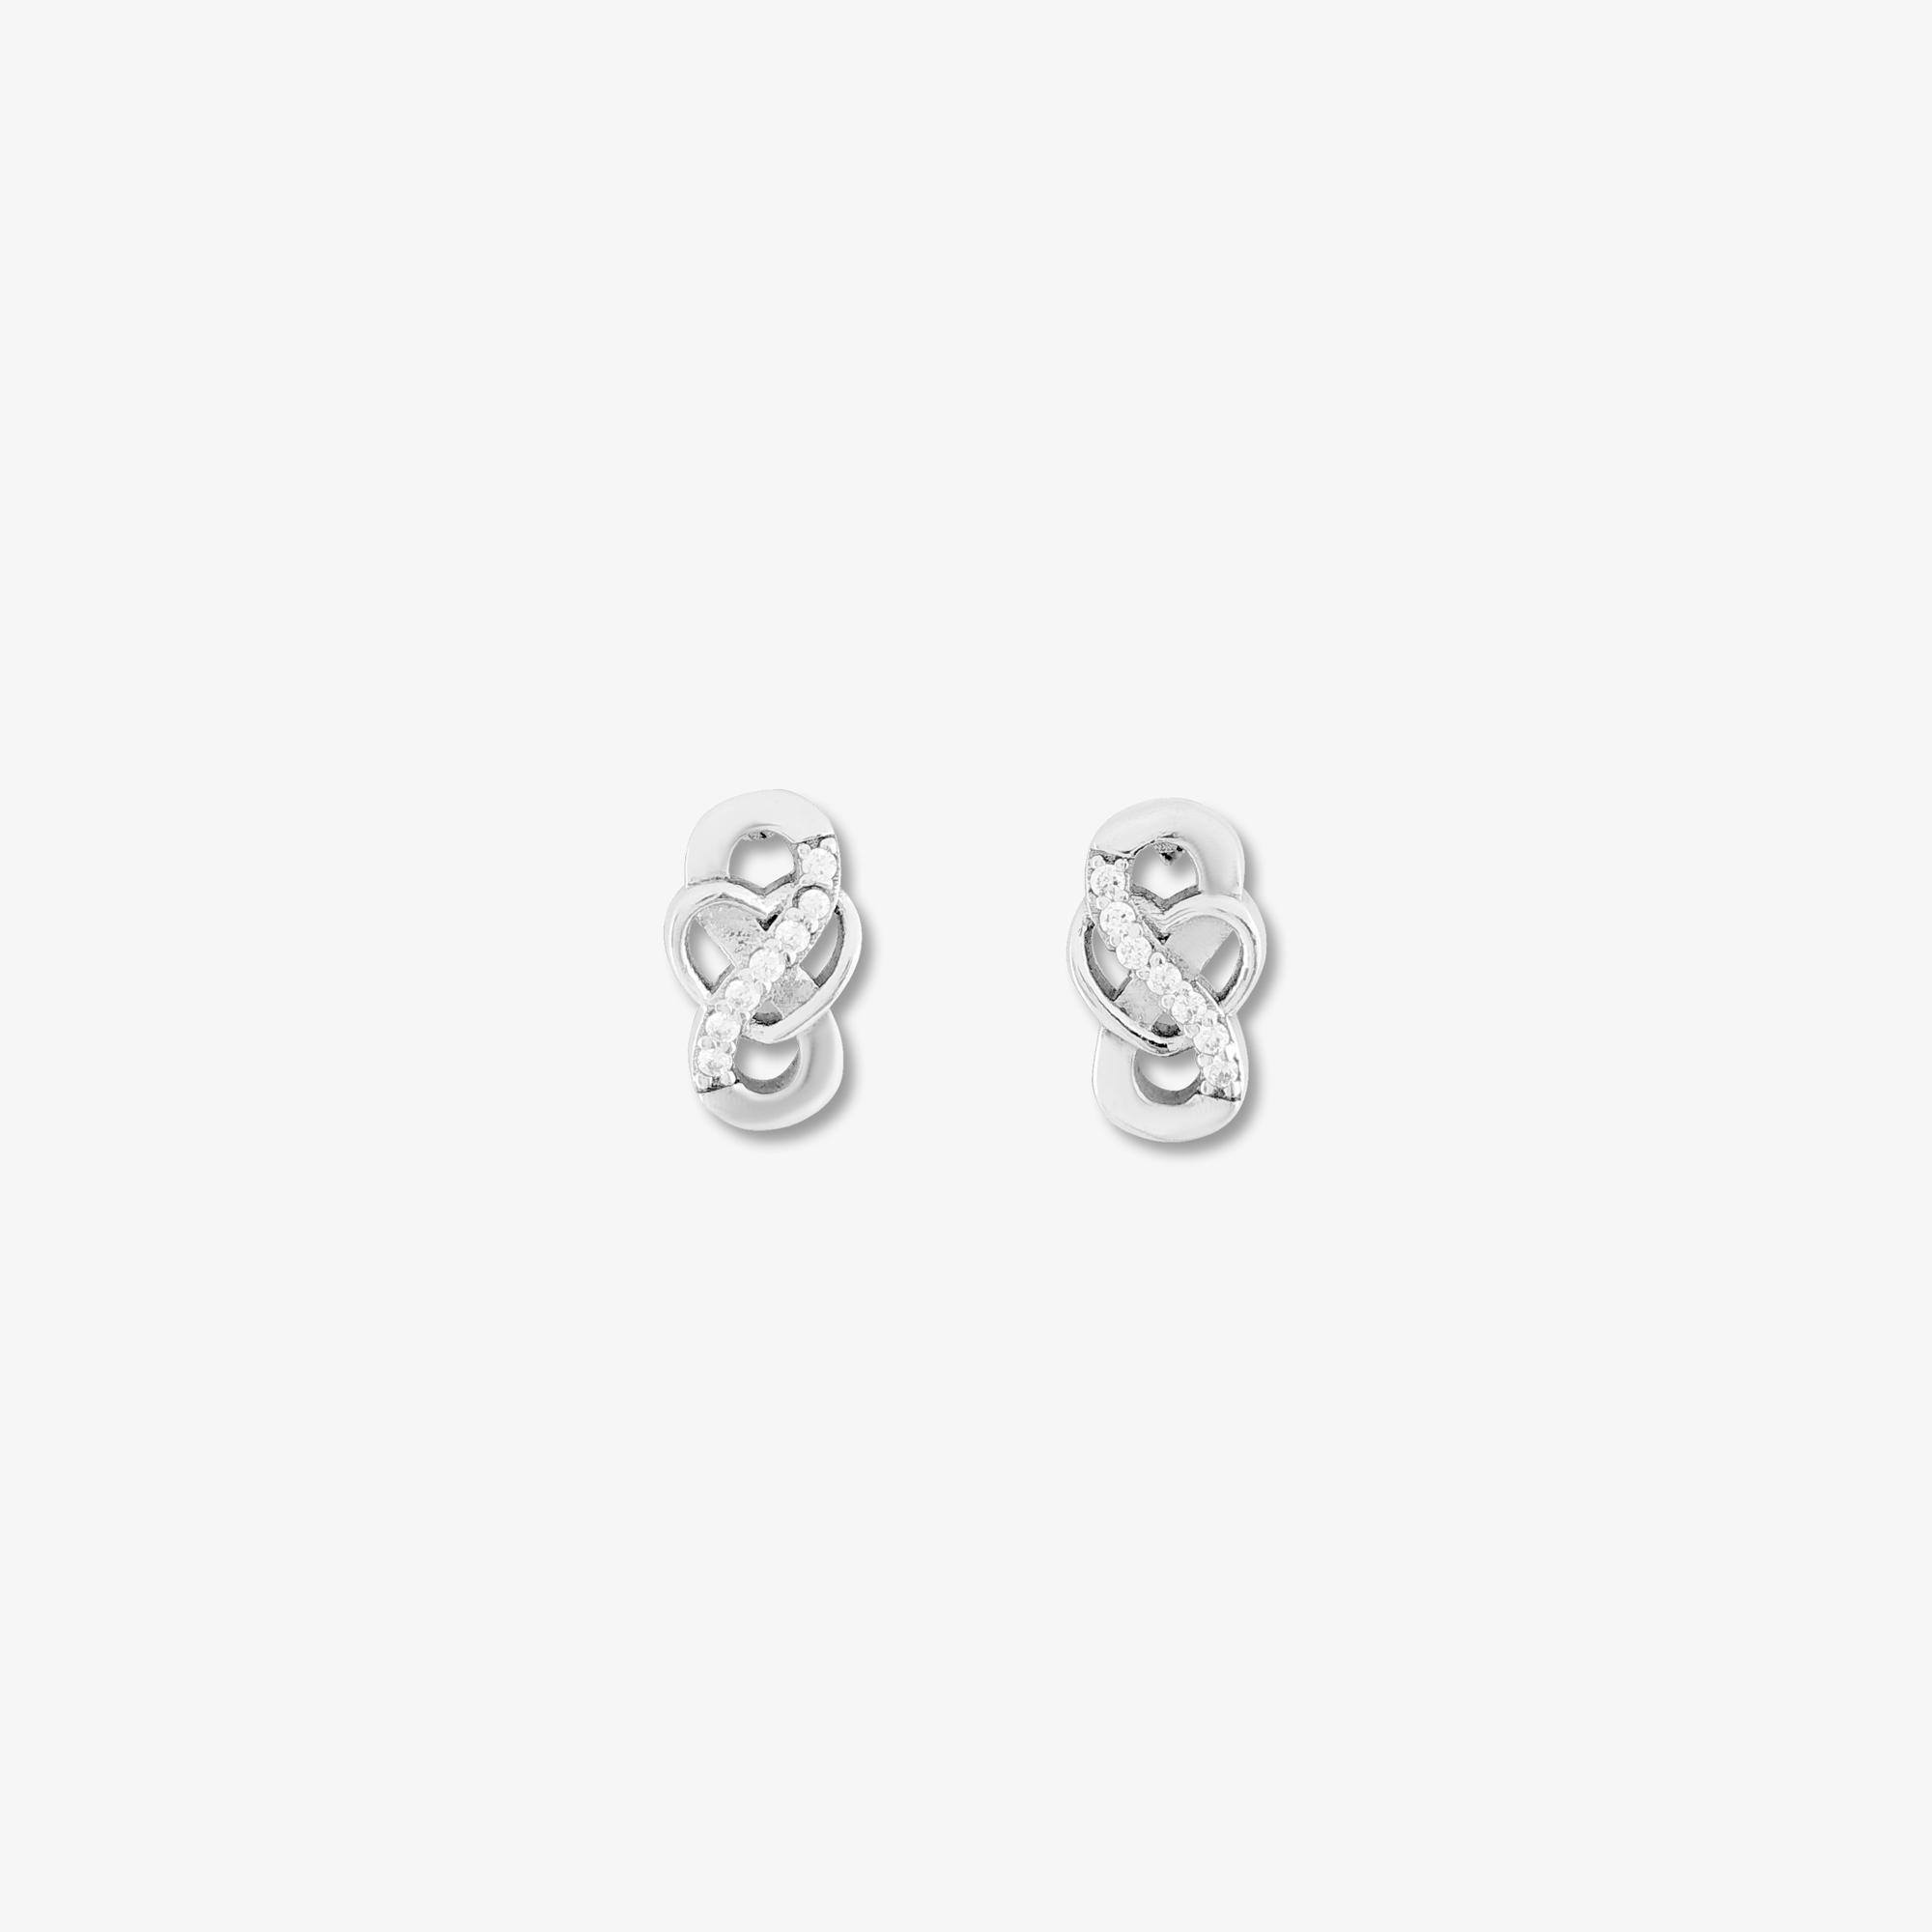 Tiny Sterling Silver Stud Earrings